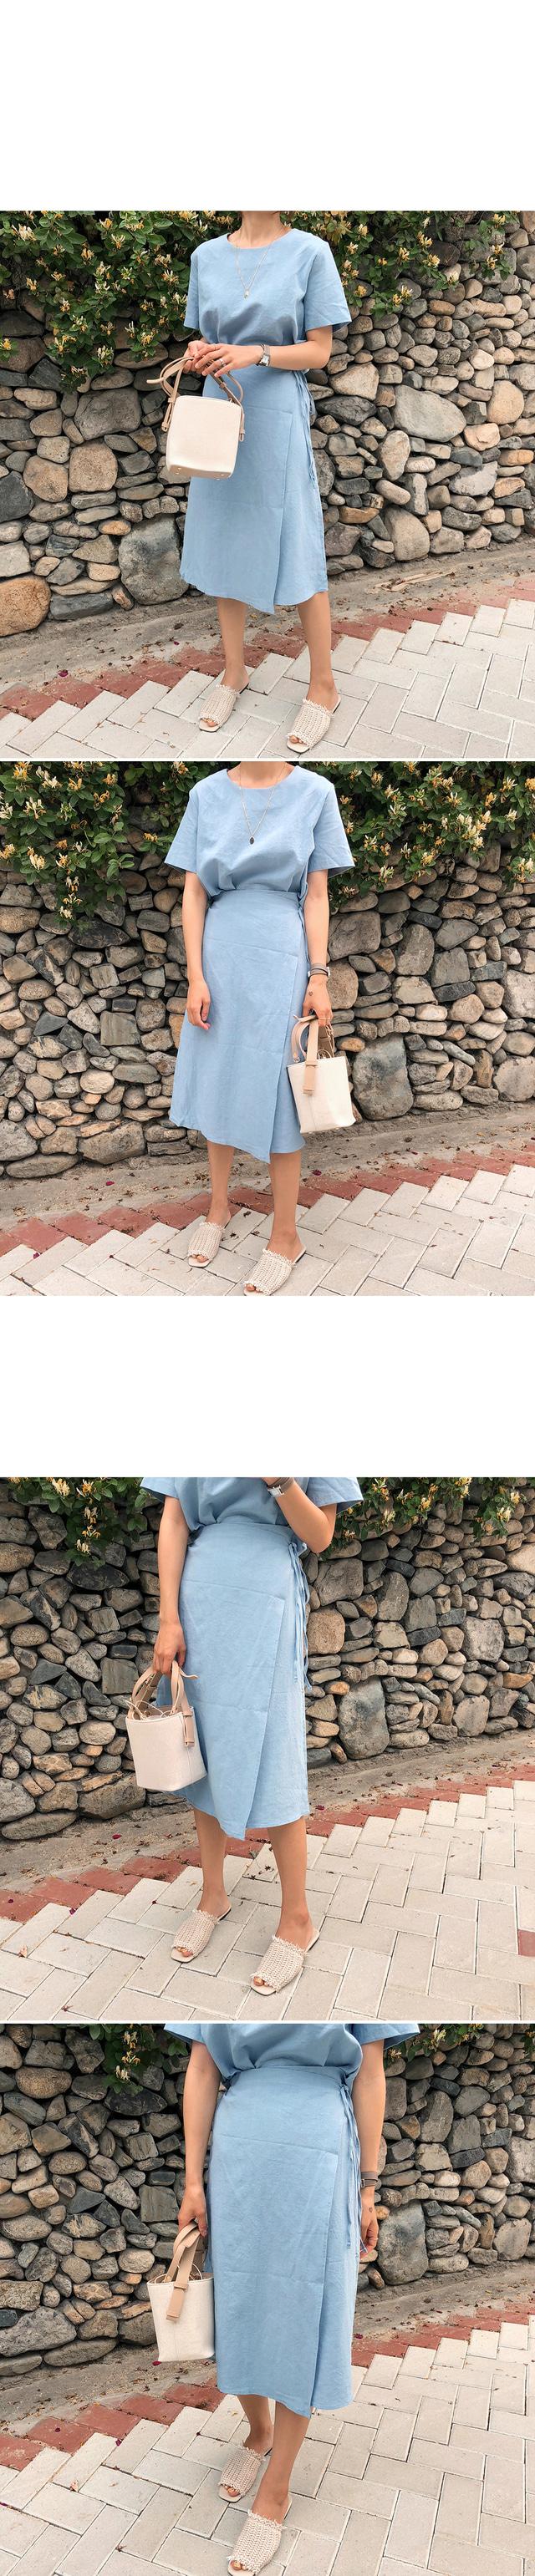 "MA-Caramel ""MY ADORABLE BAG"" mini square bag"